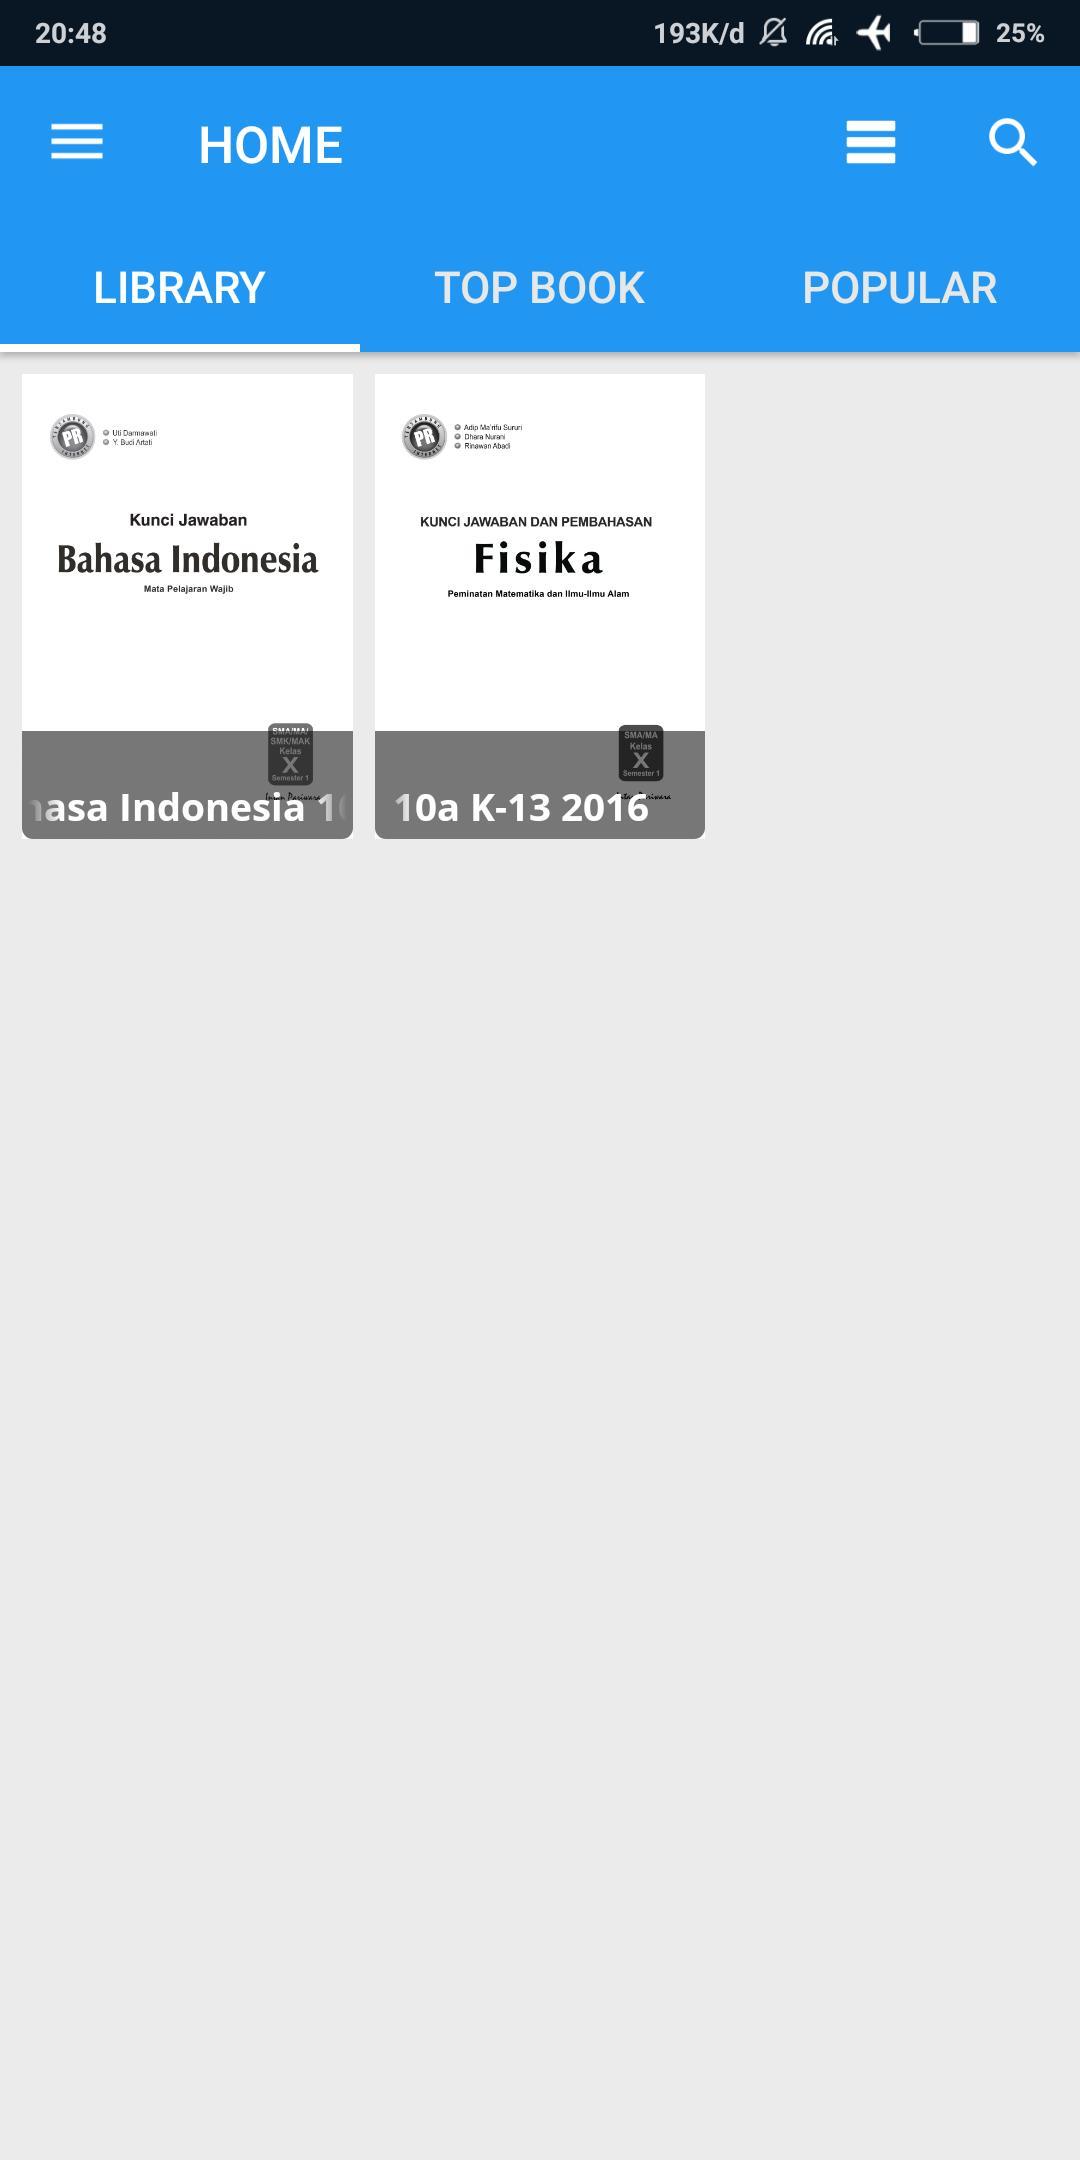 Kumpulan Kunci Jawaban Buku Intan Pariwara For Android Apk Download